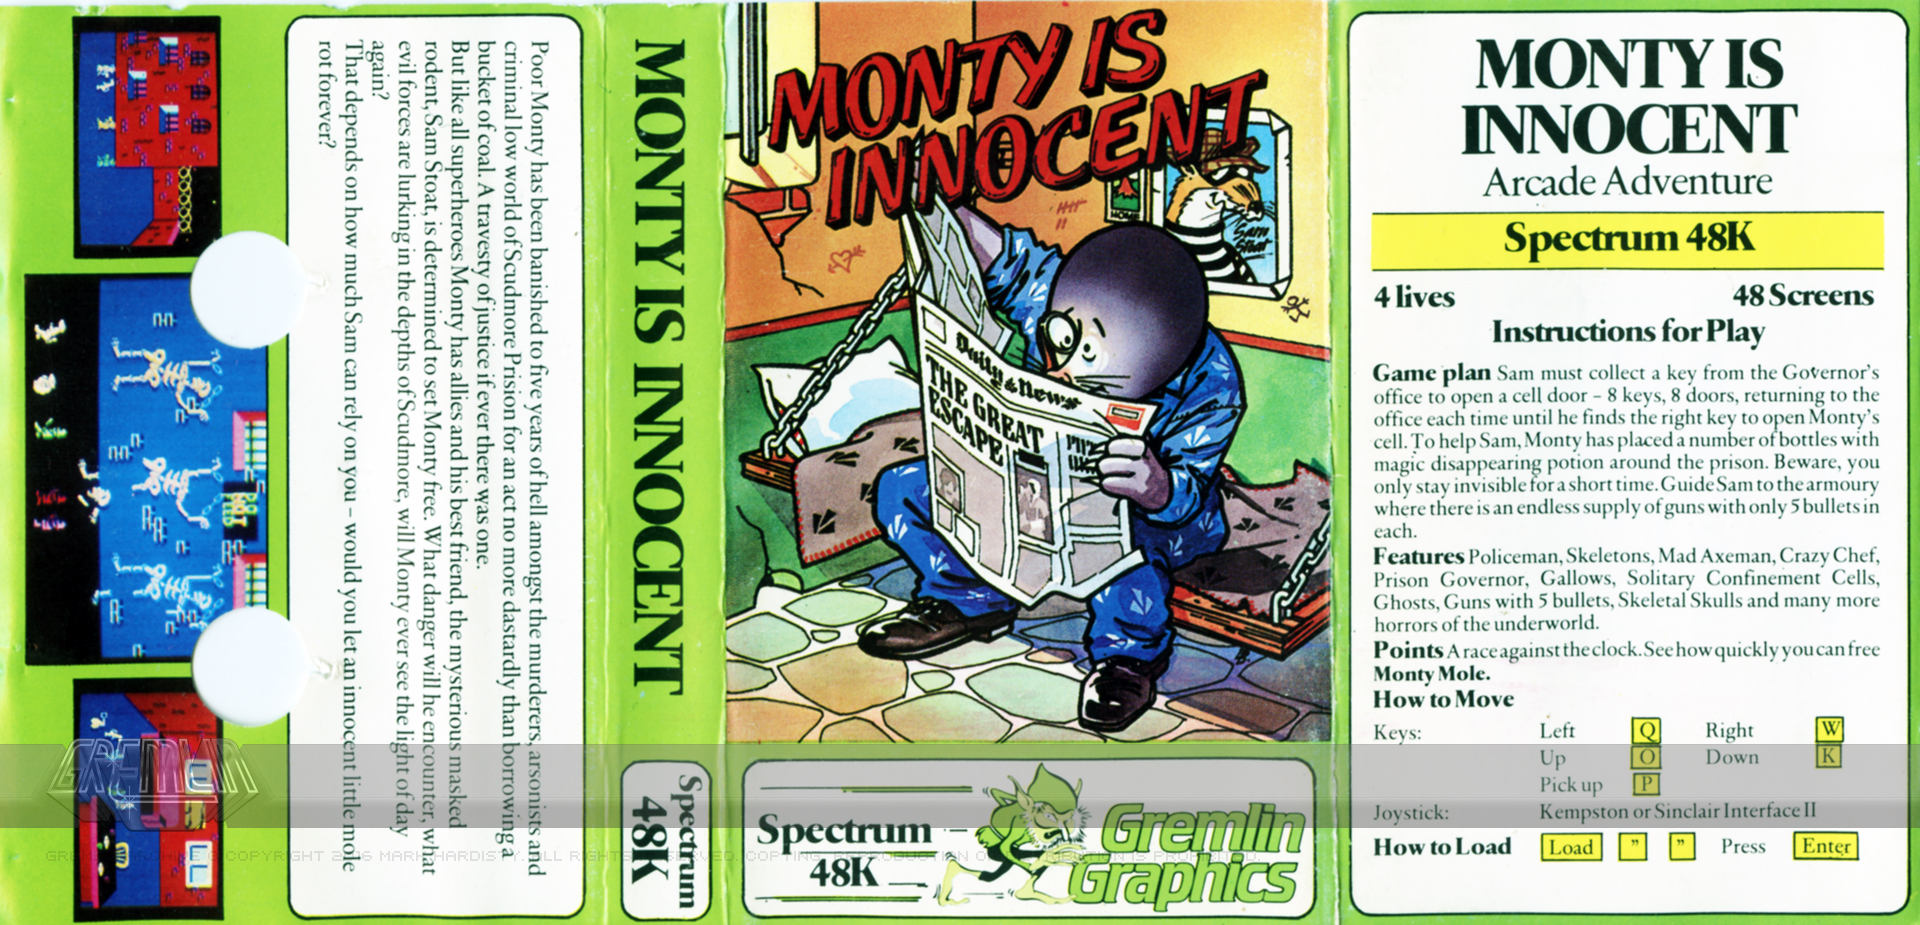 Monty Is Innocent